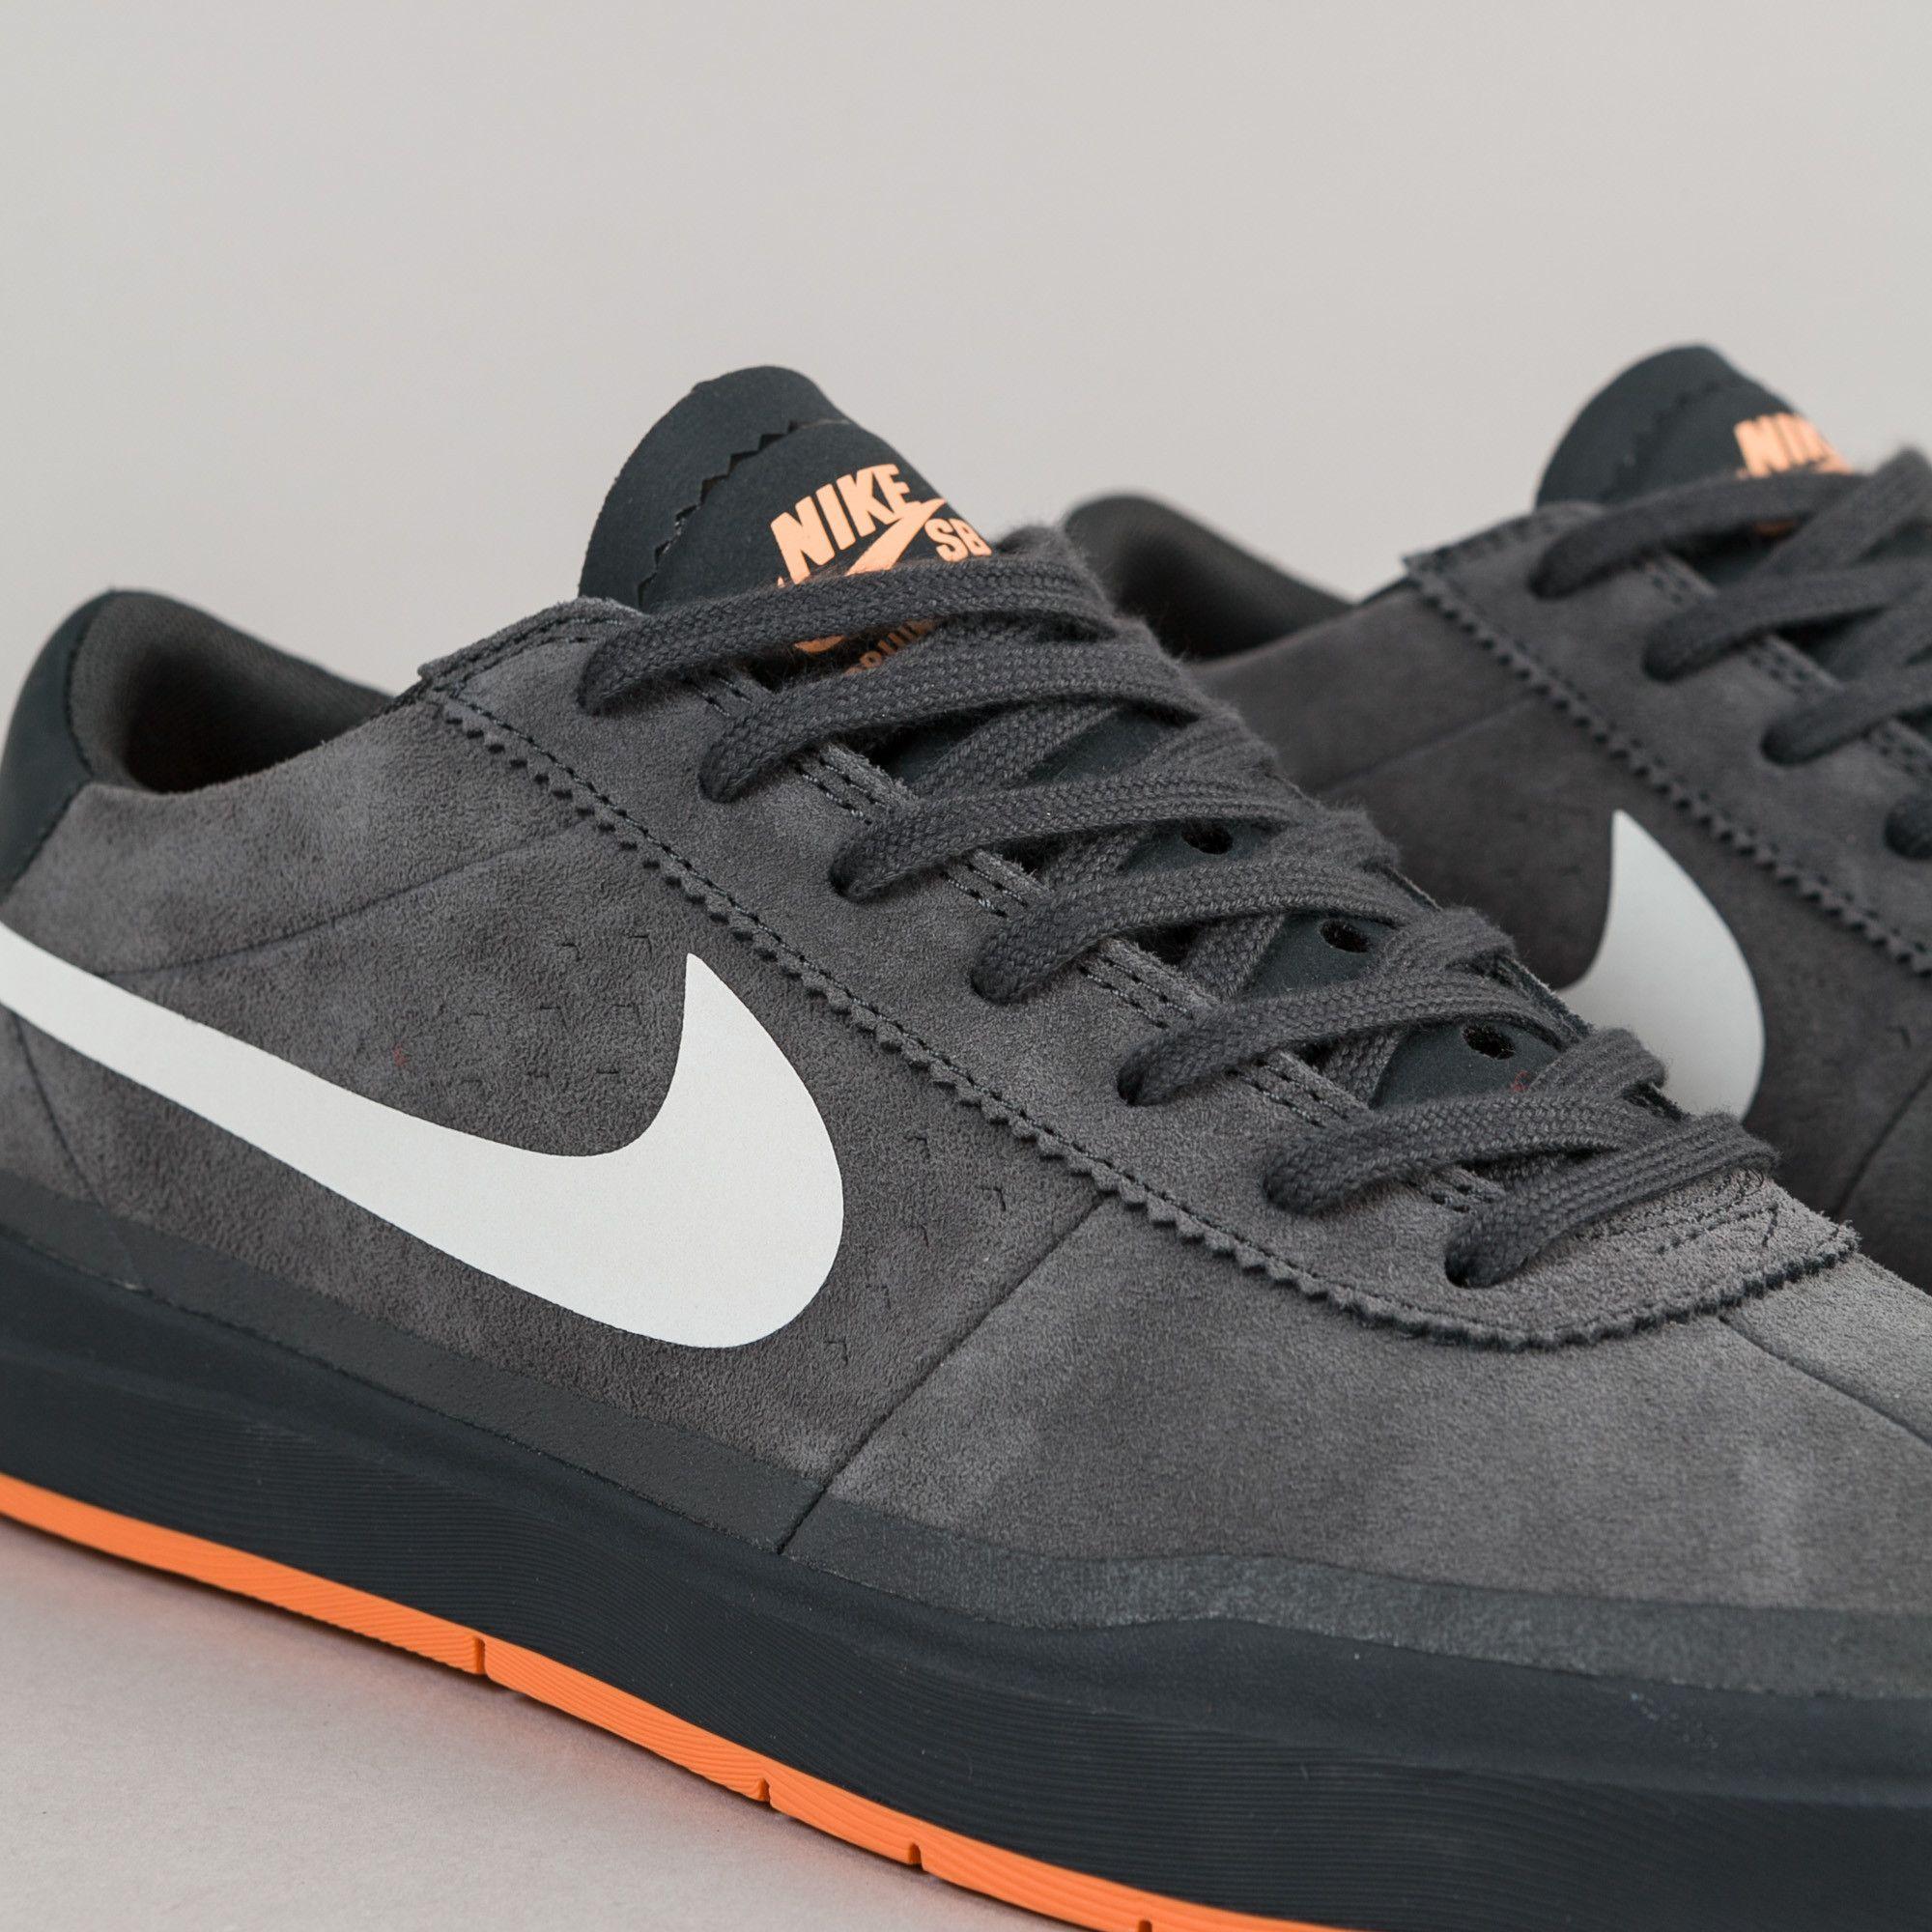 Nike SB Bruin Hyperfeel XT Shoes - Anthracite / White - Clay Orange